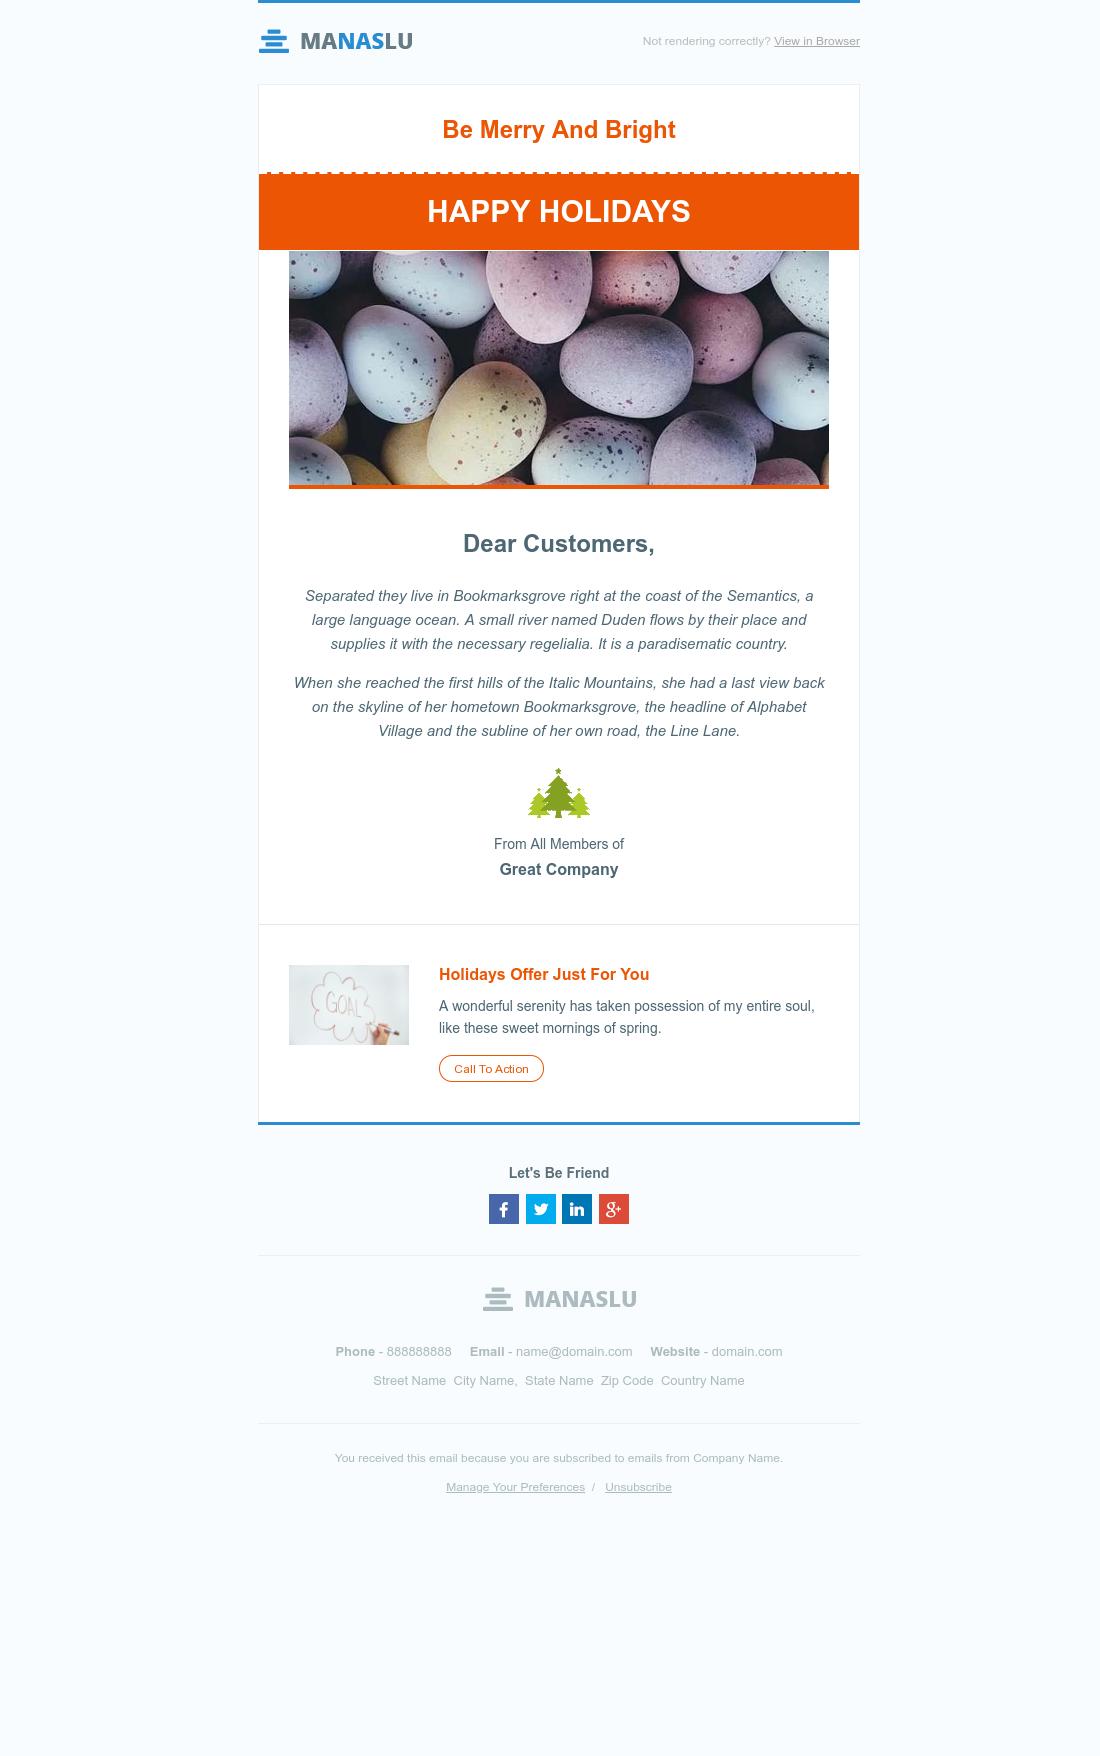 Manaslu holiday greetings email template v23 hubspot externallink m4hsunfo